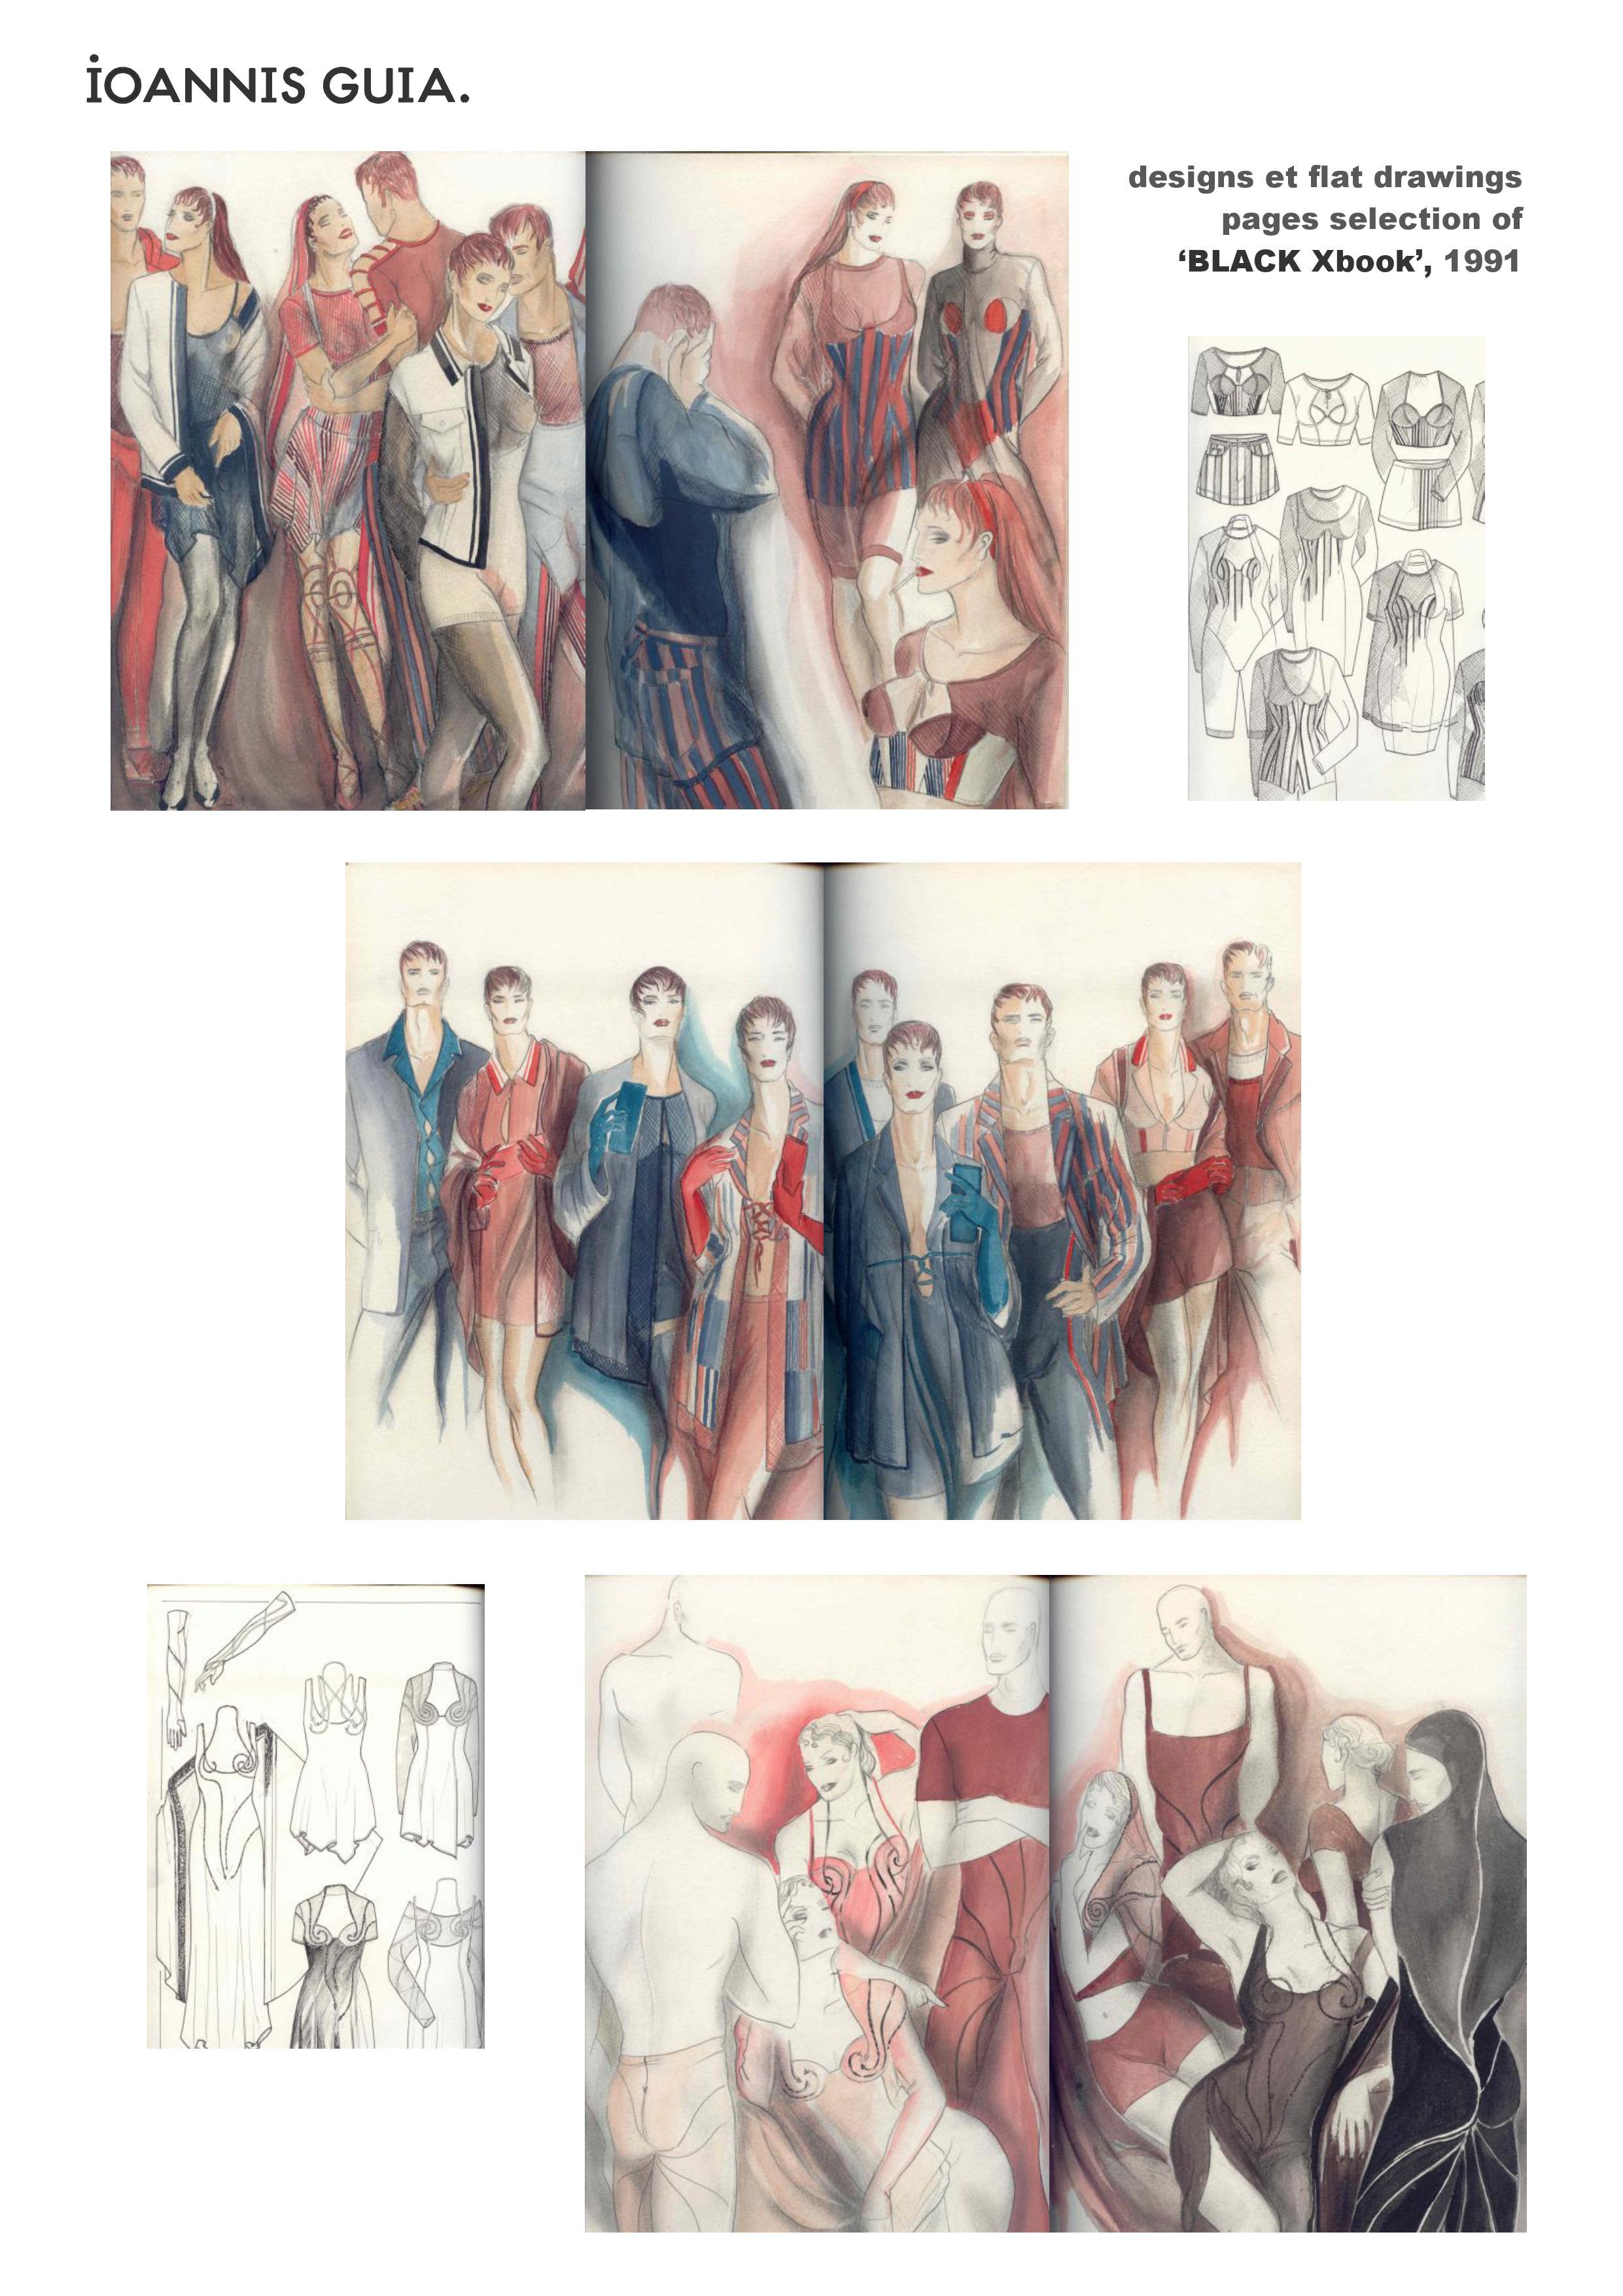 designs of Ioannis Guia